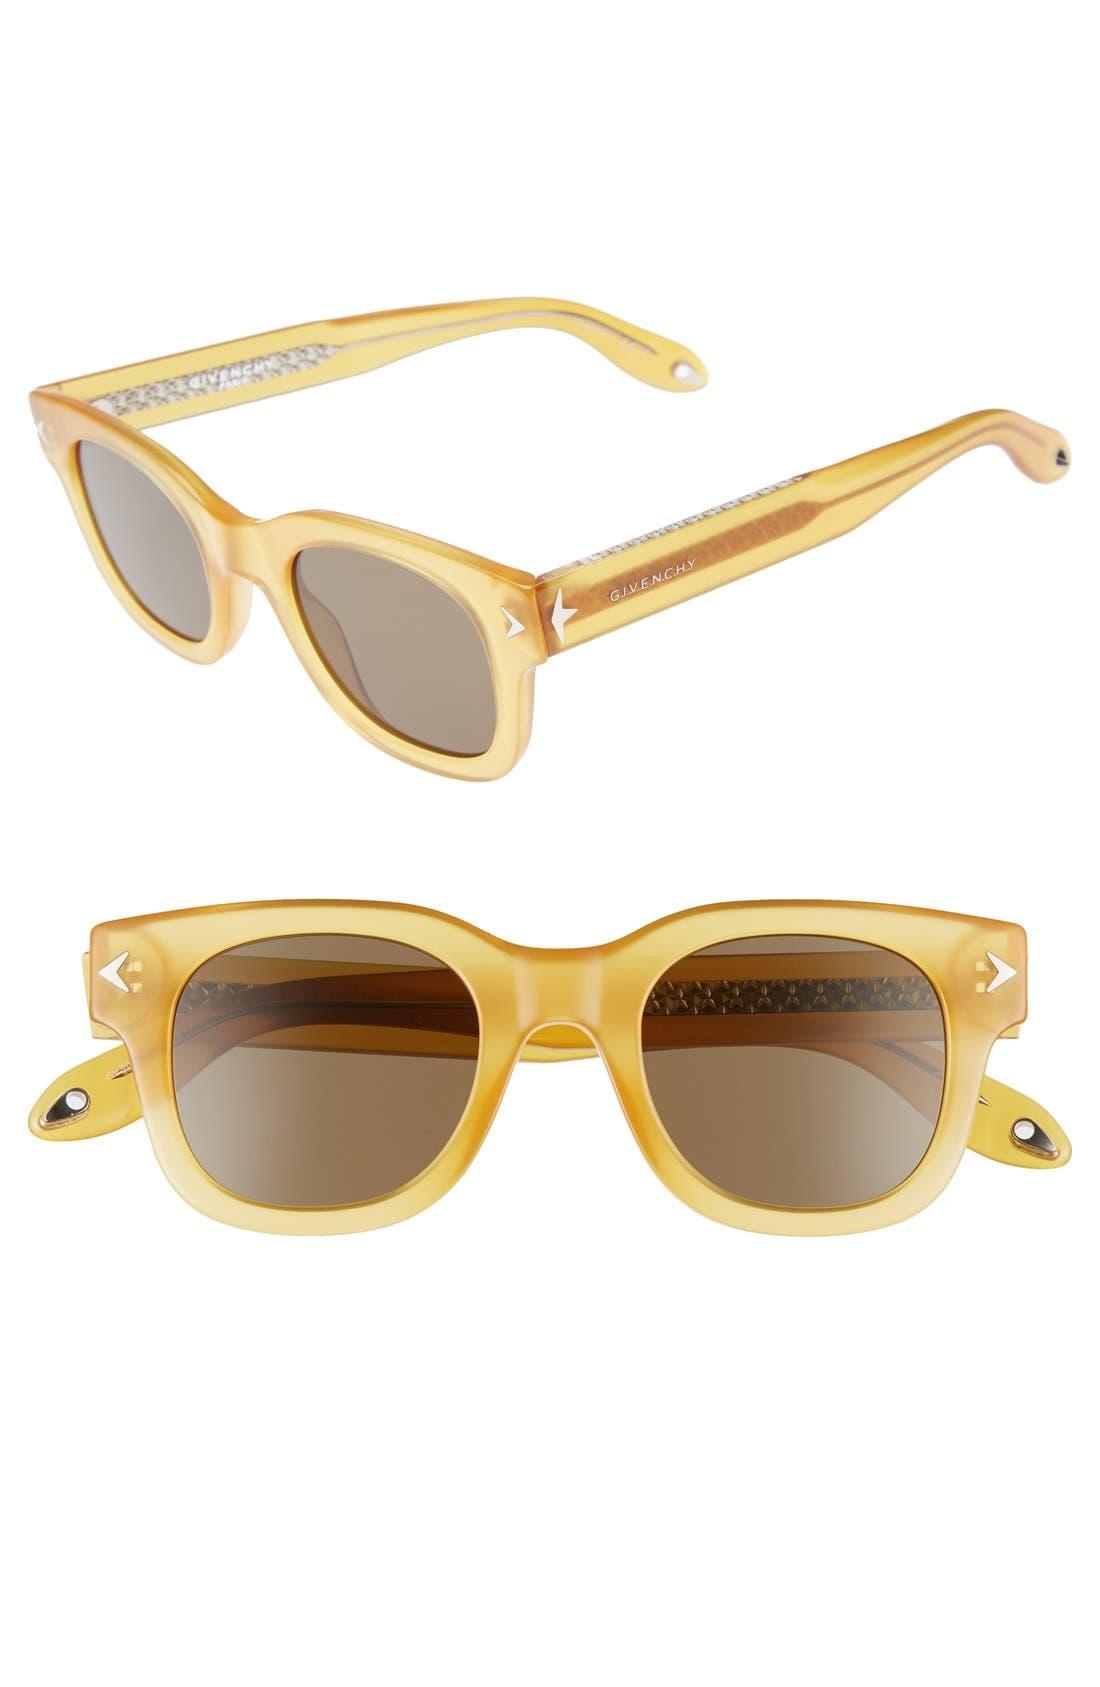 47mm Gradient Sunglasses,                         Main,                         color, Ochre